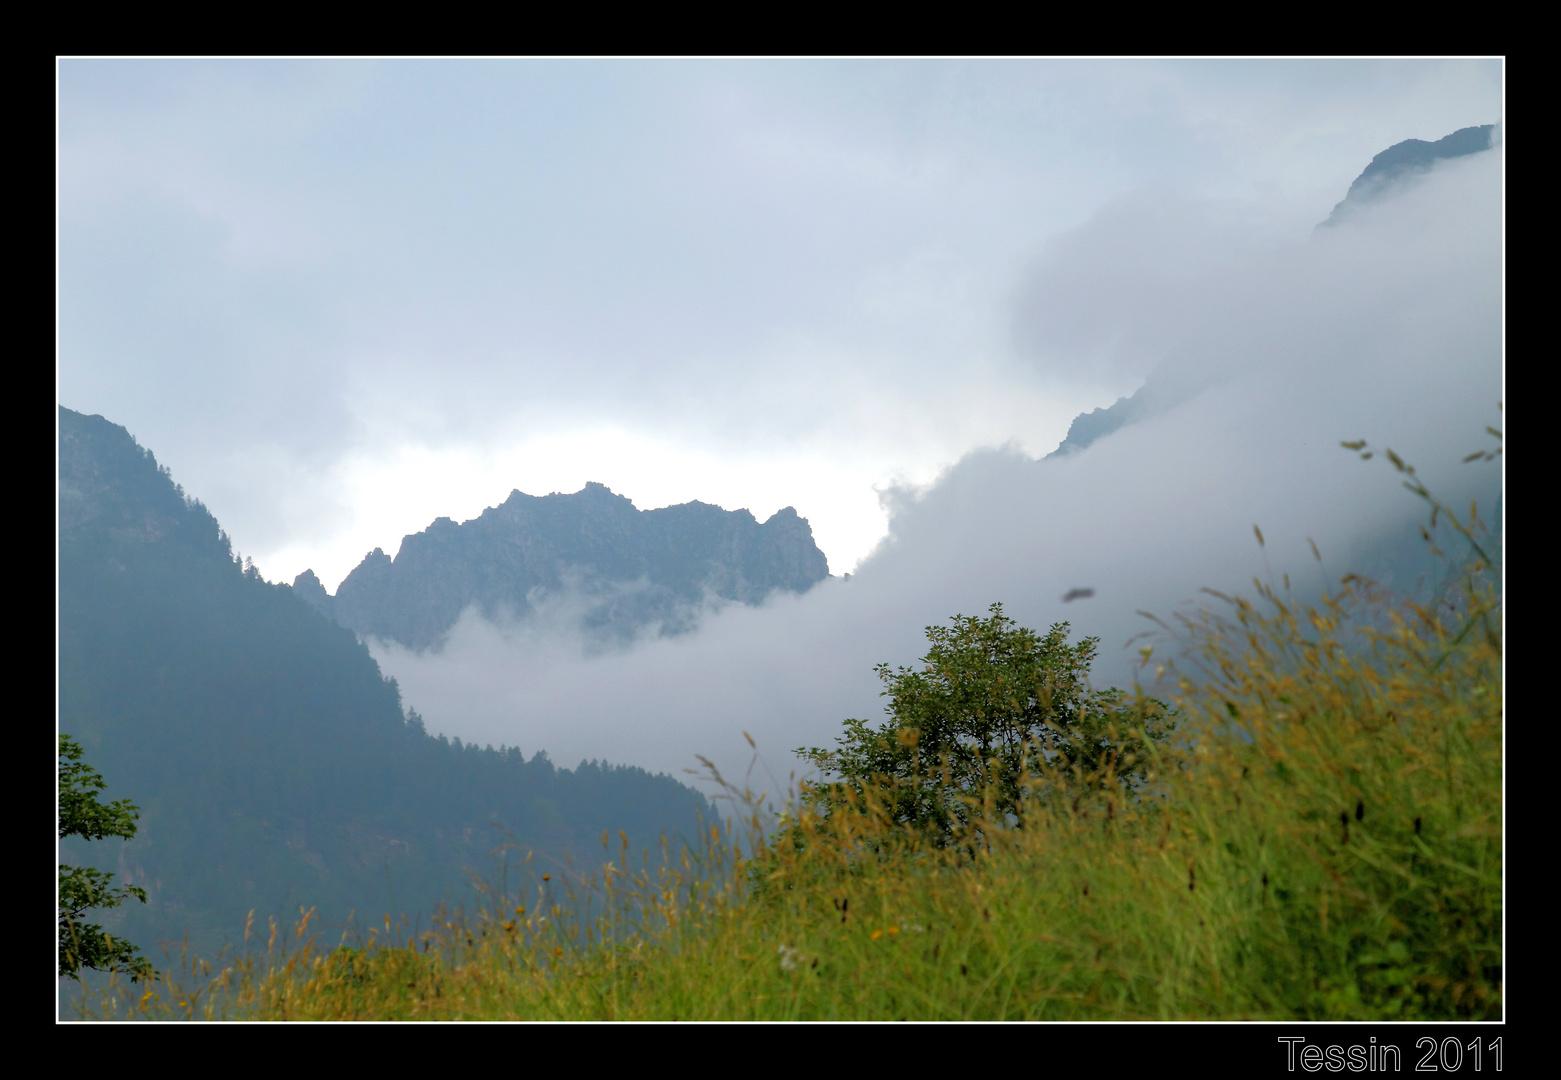 Tessin 2011 Valle Verzasca Das Wetter zieht ins Tal...